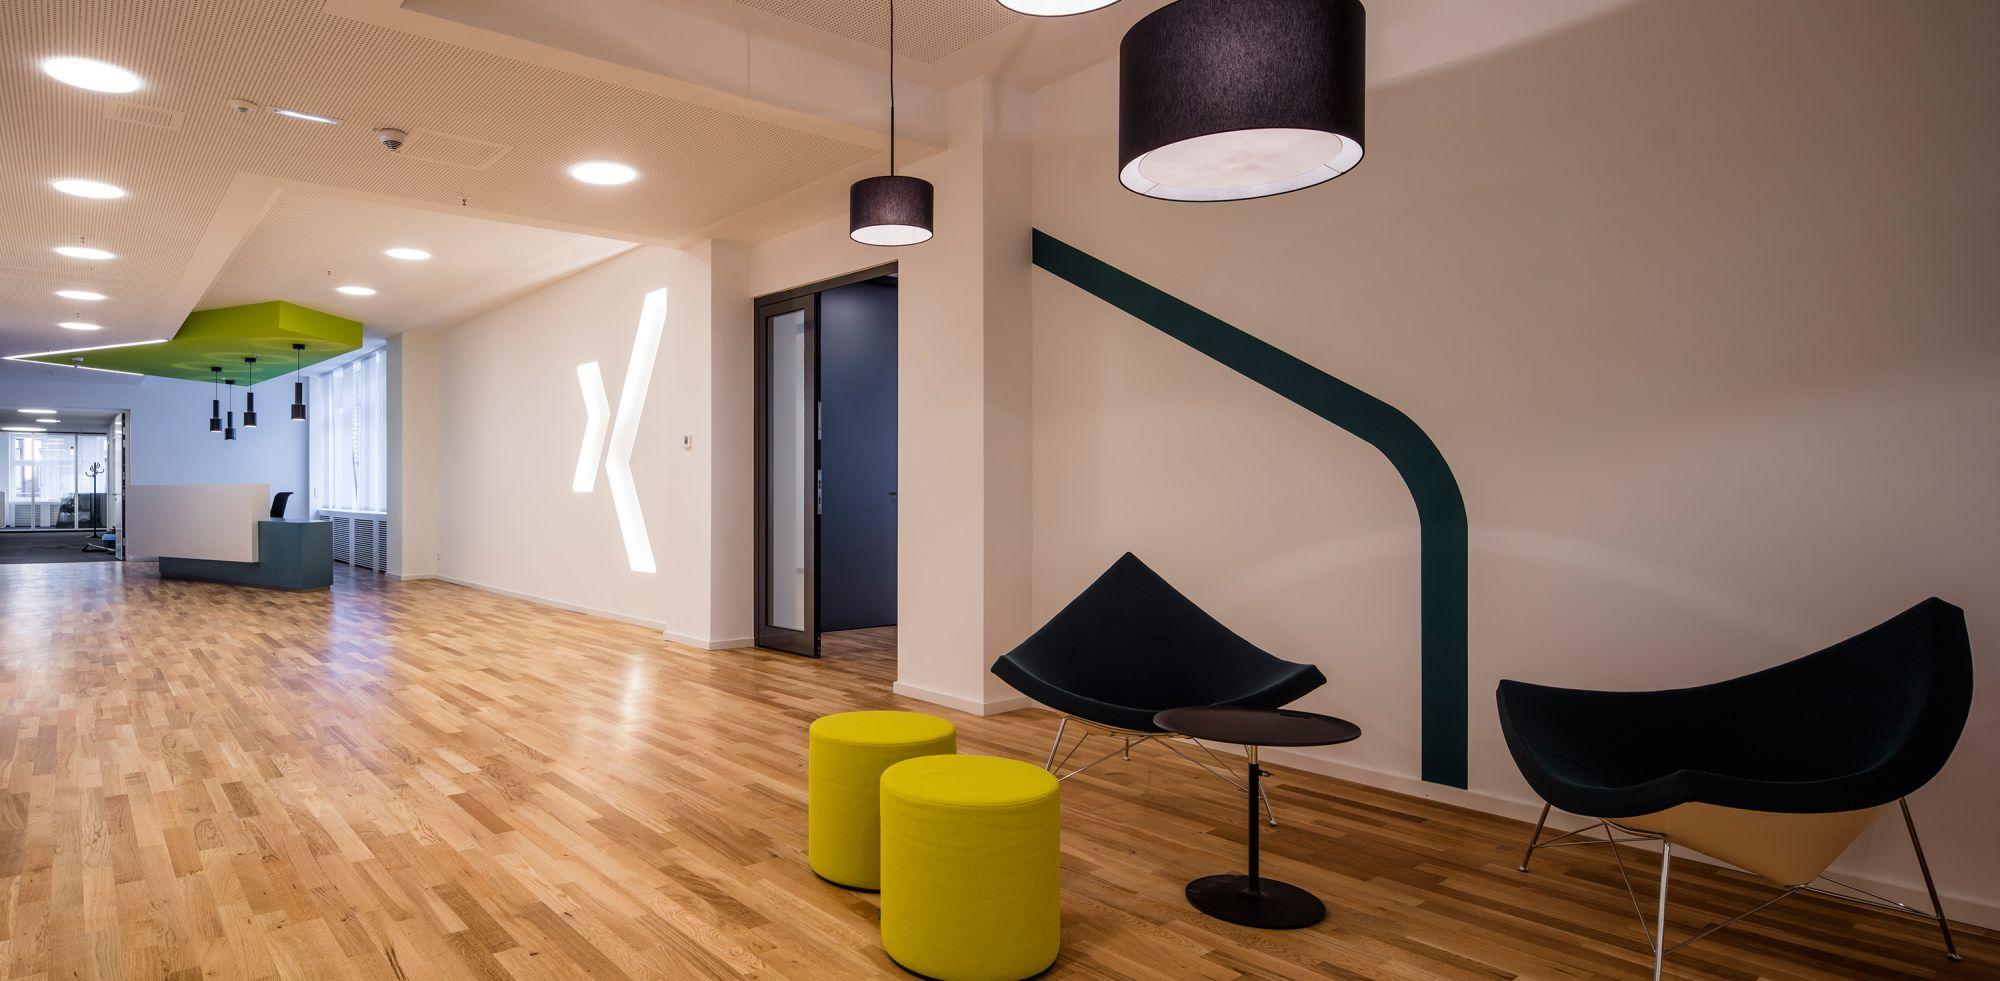 XING E Recruiting / Gärtner Internationale Möbel